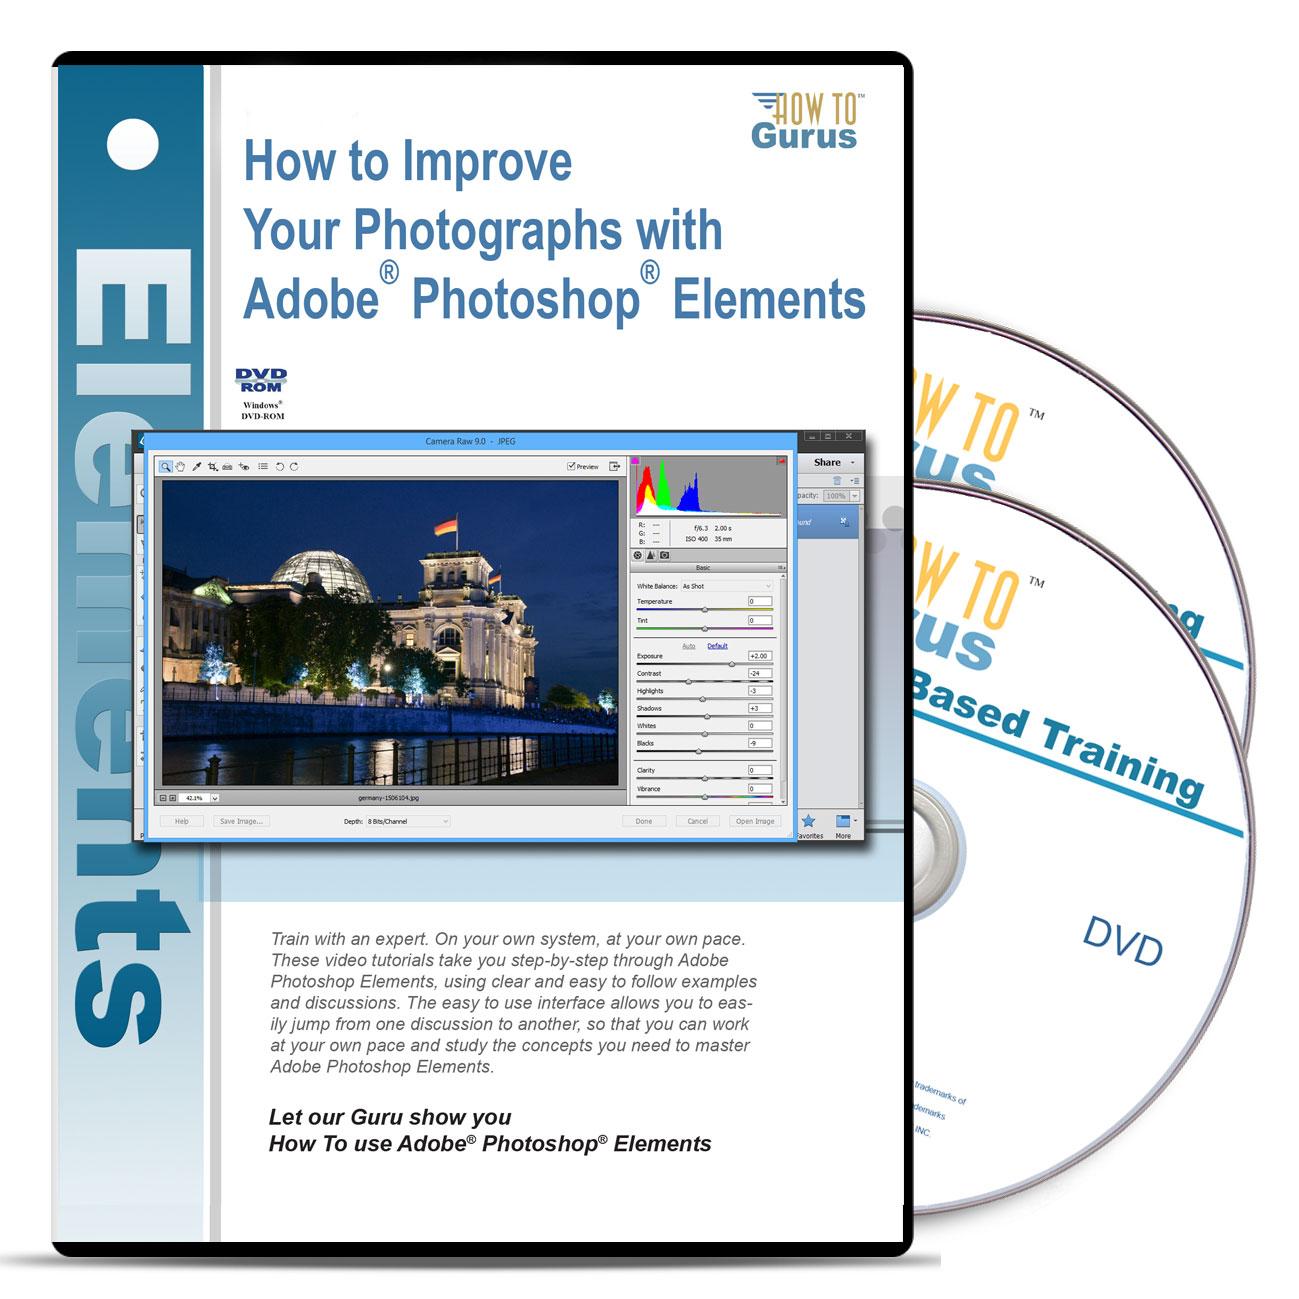 Improve your photographs with photoshop elements how to gurus baditri Images